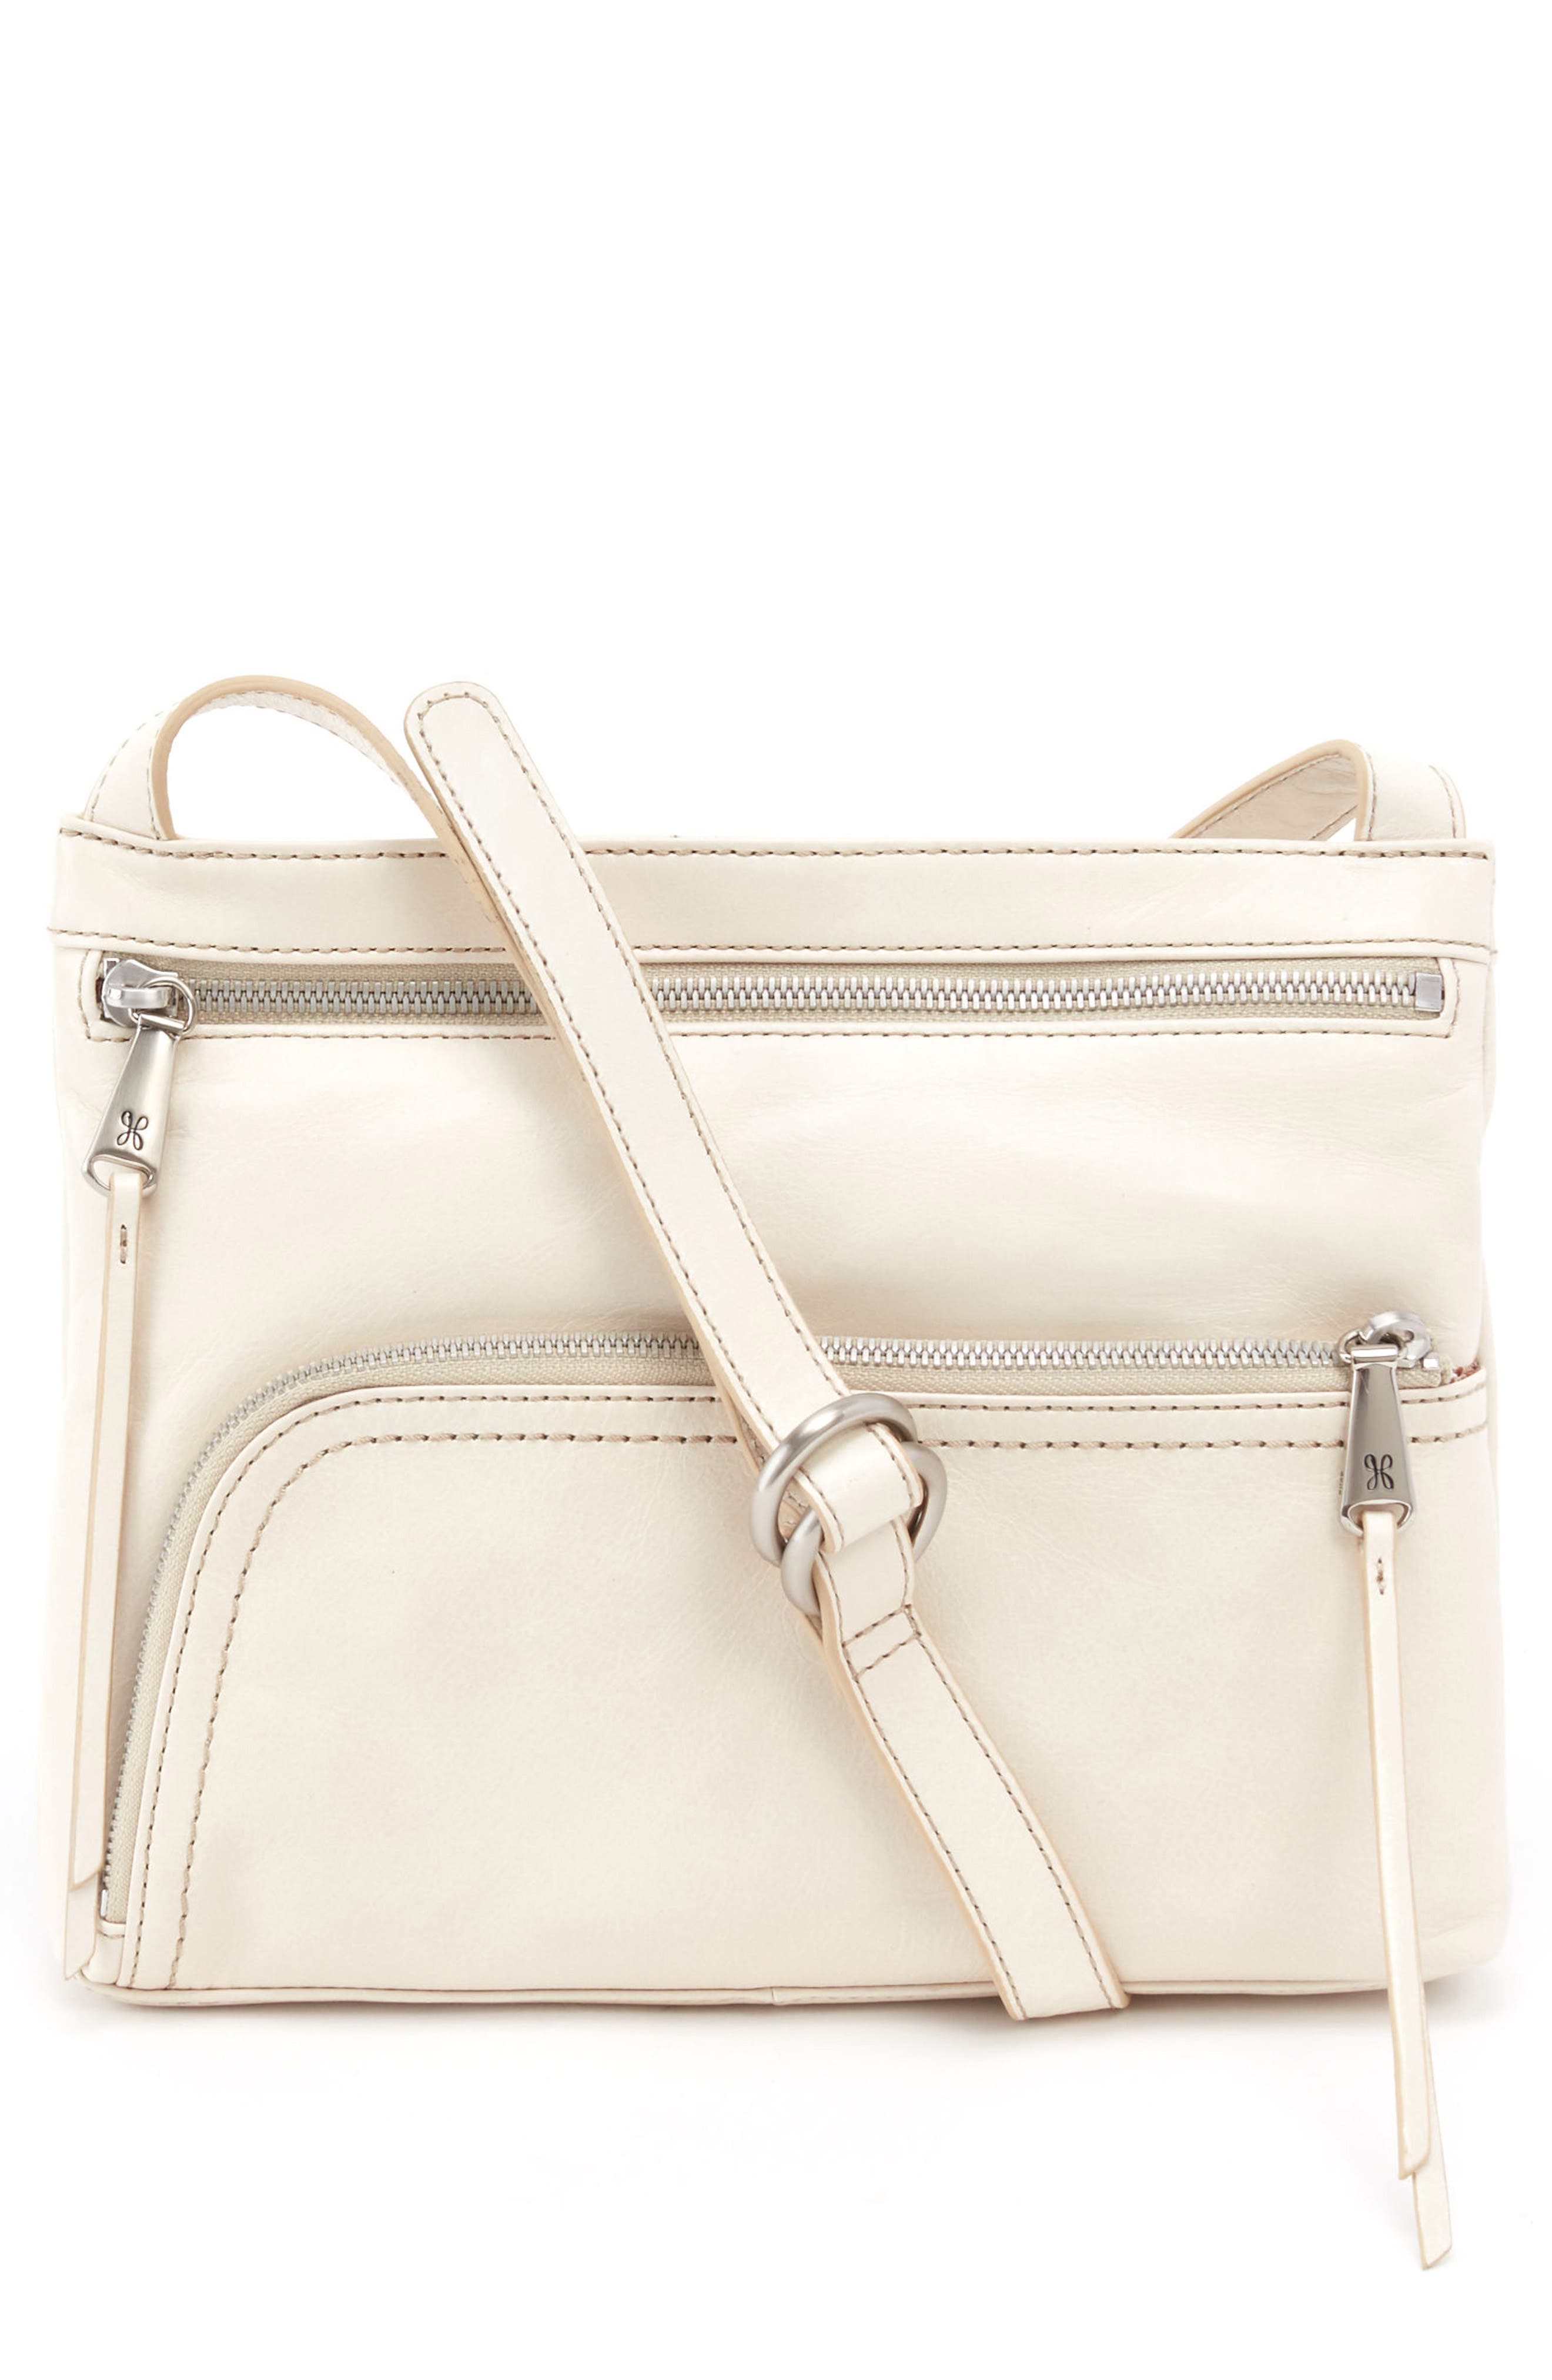 'Cassie' Crossbody Bag,                             Main thumbnail 1, color,                             120